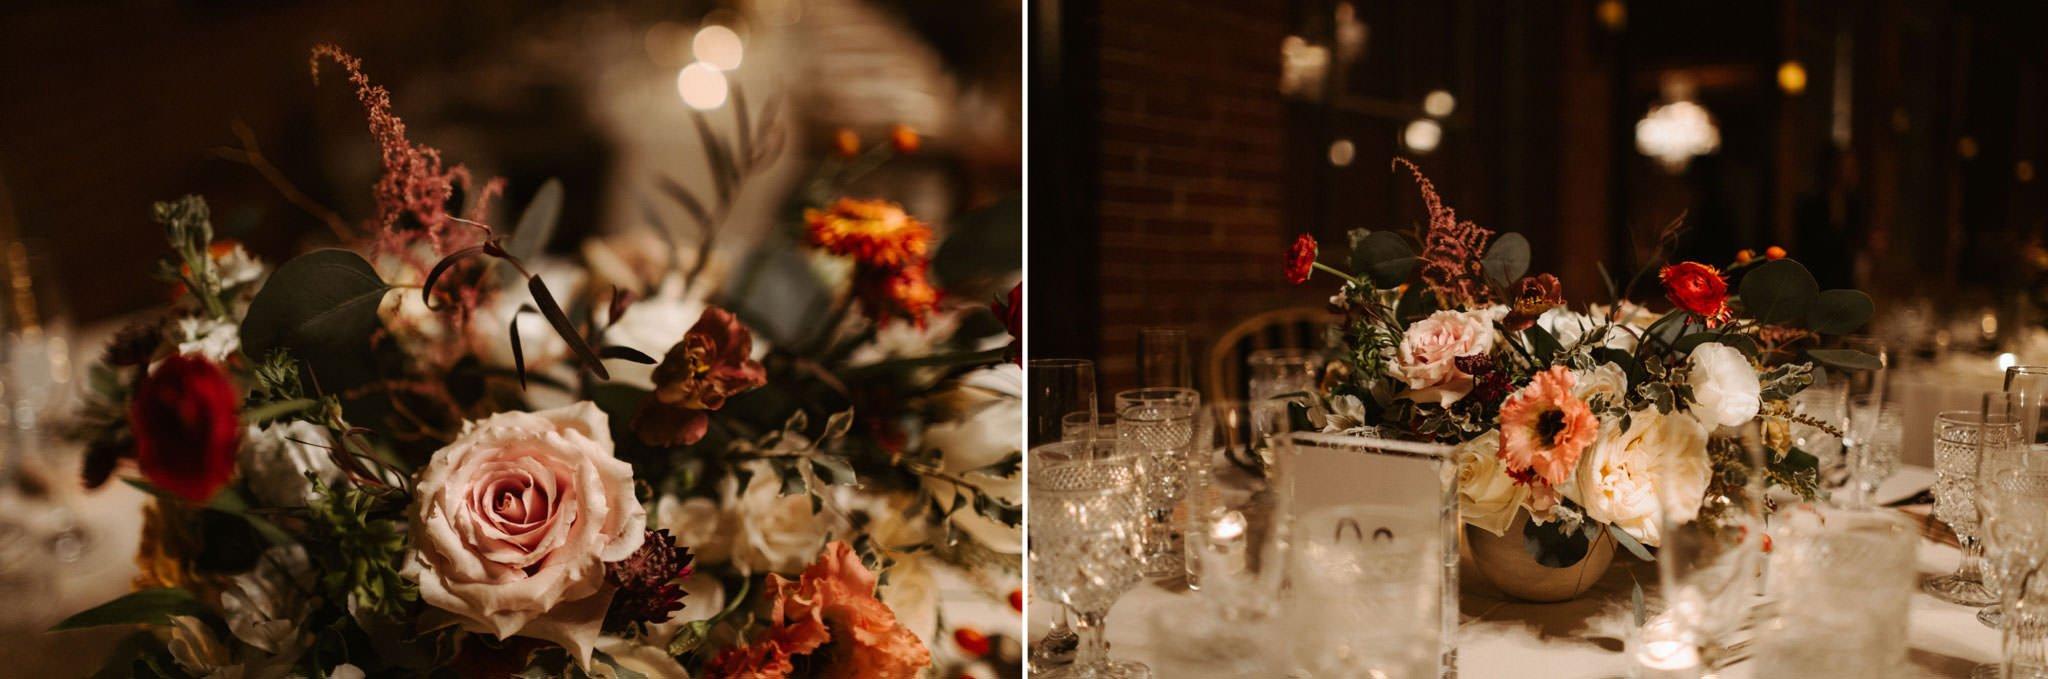 carondelet house wedding 117